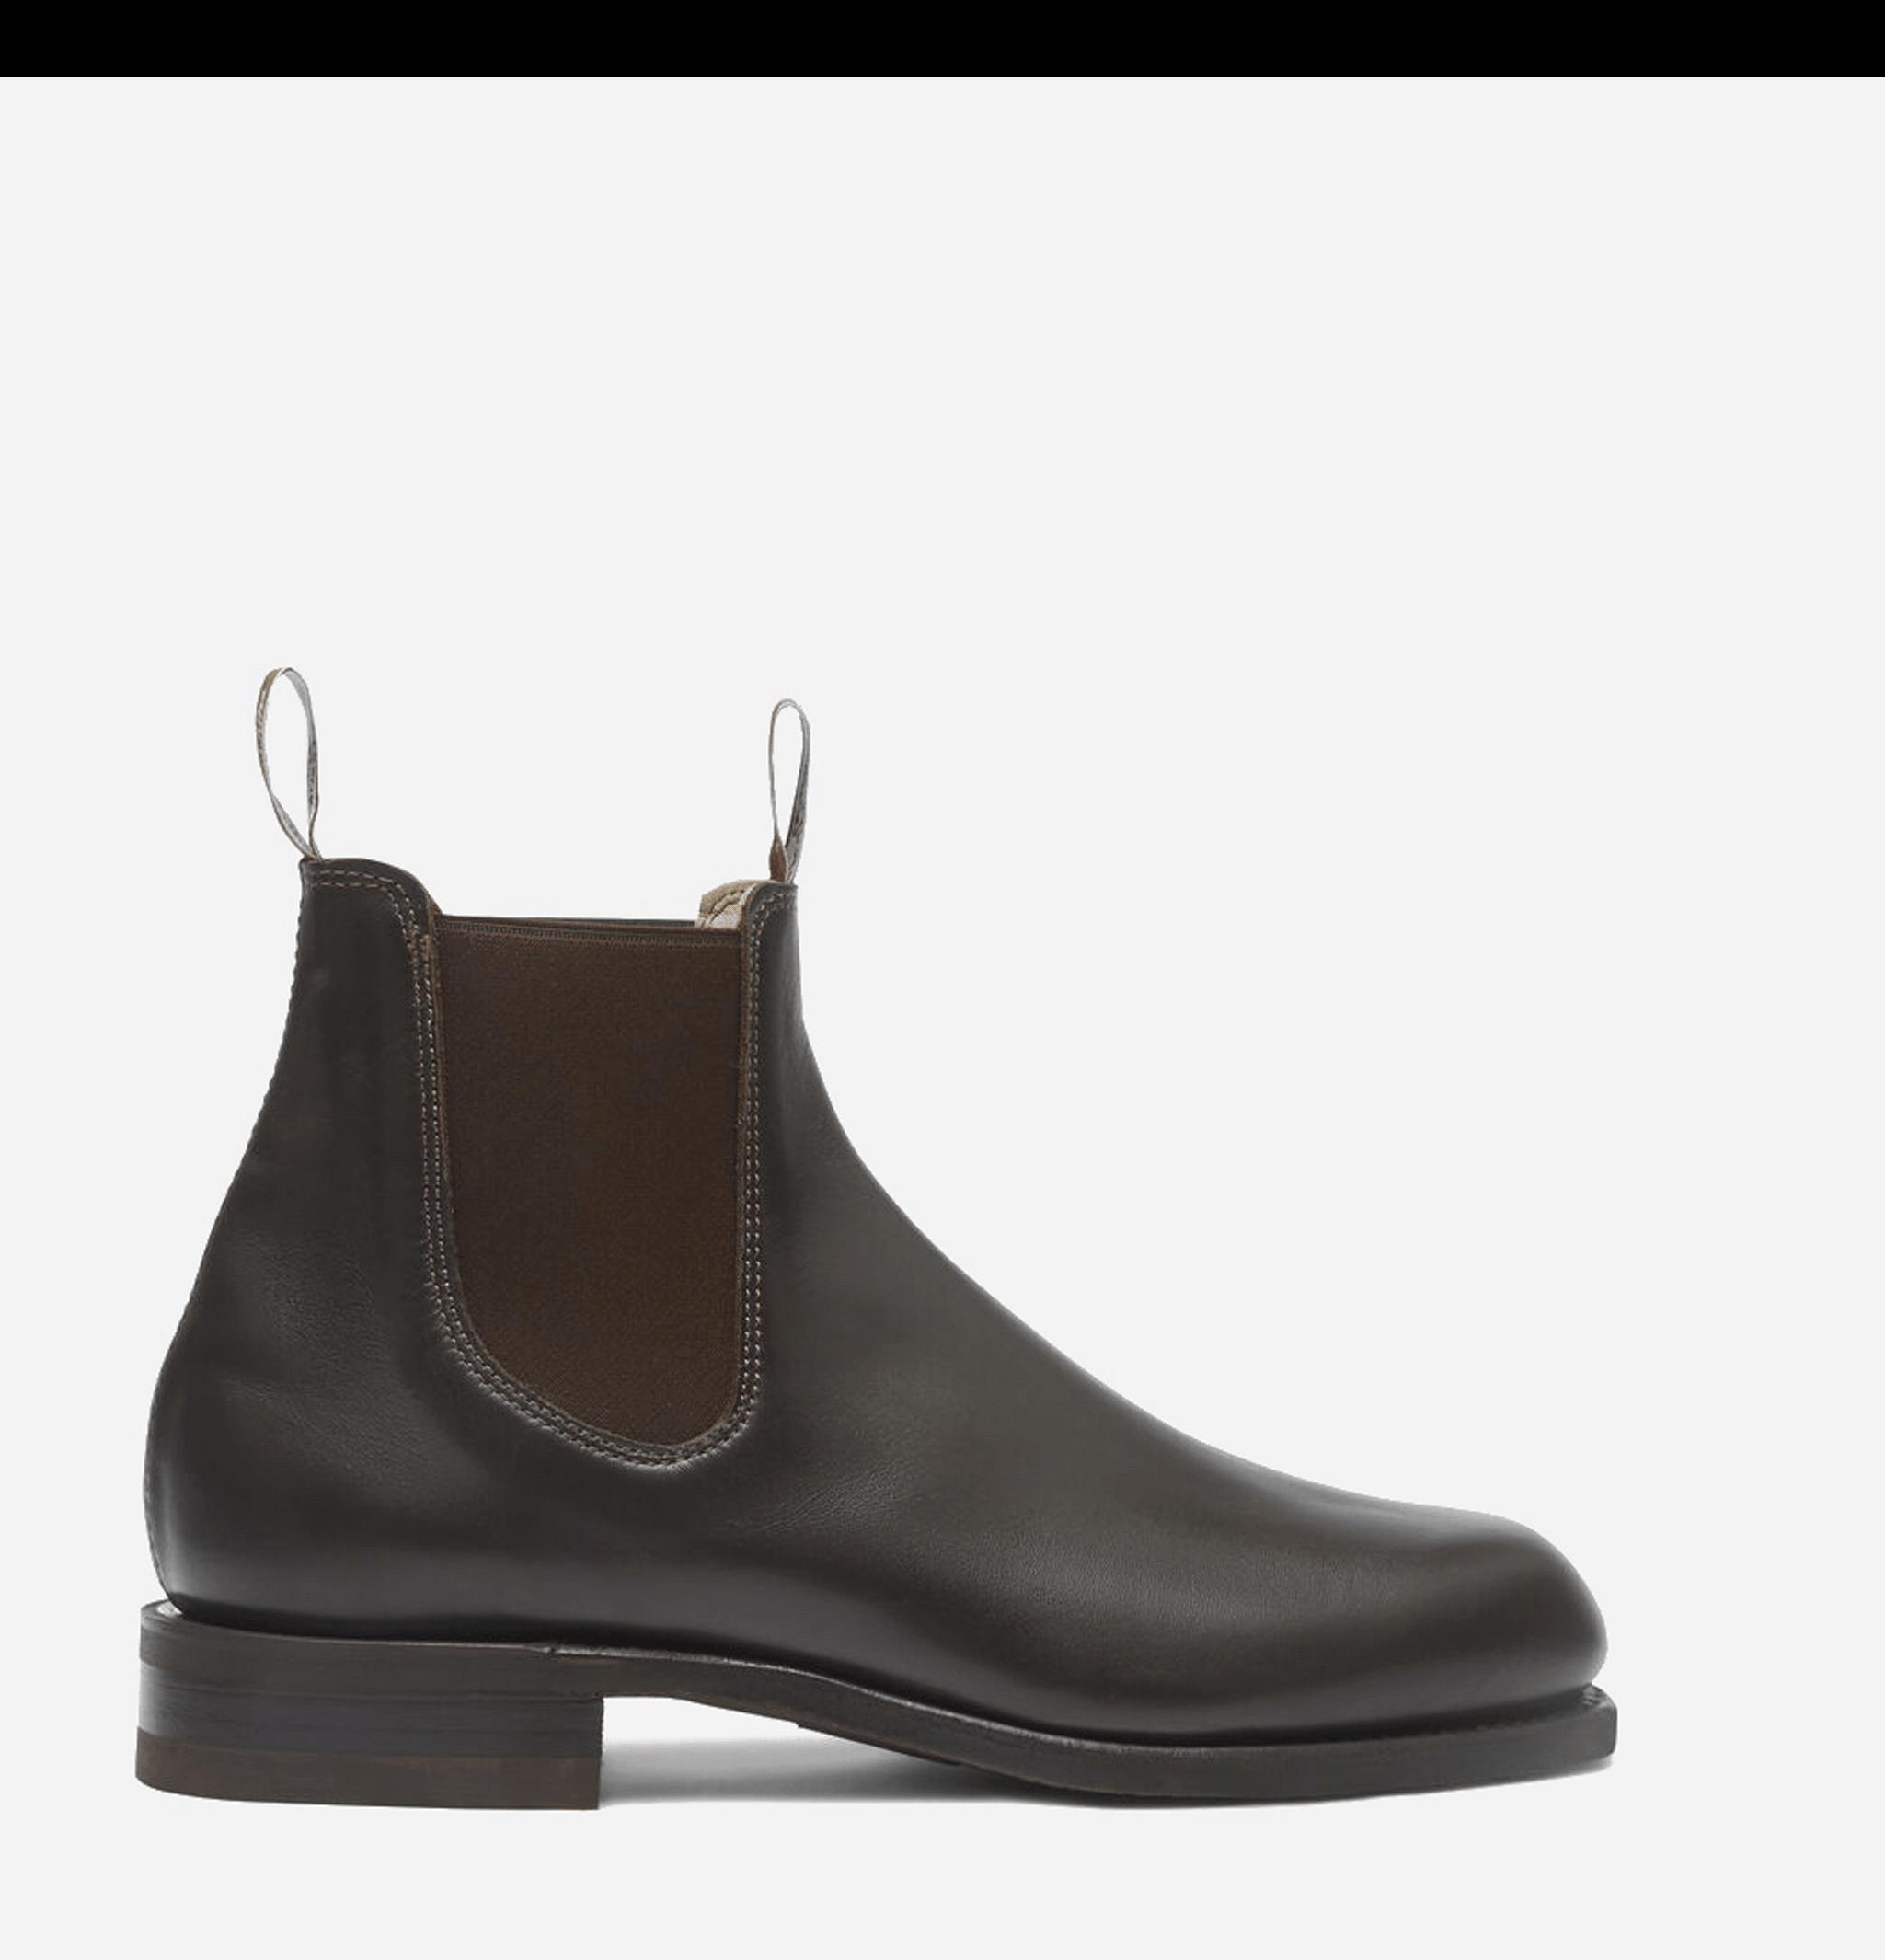 Comfort Turnout Boots Chestnut